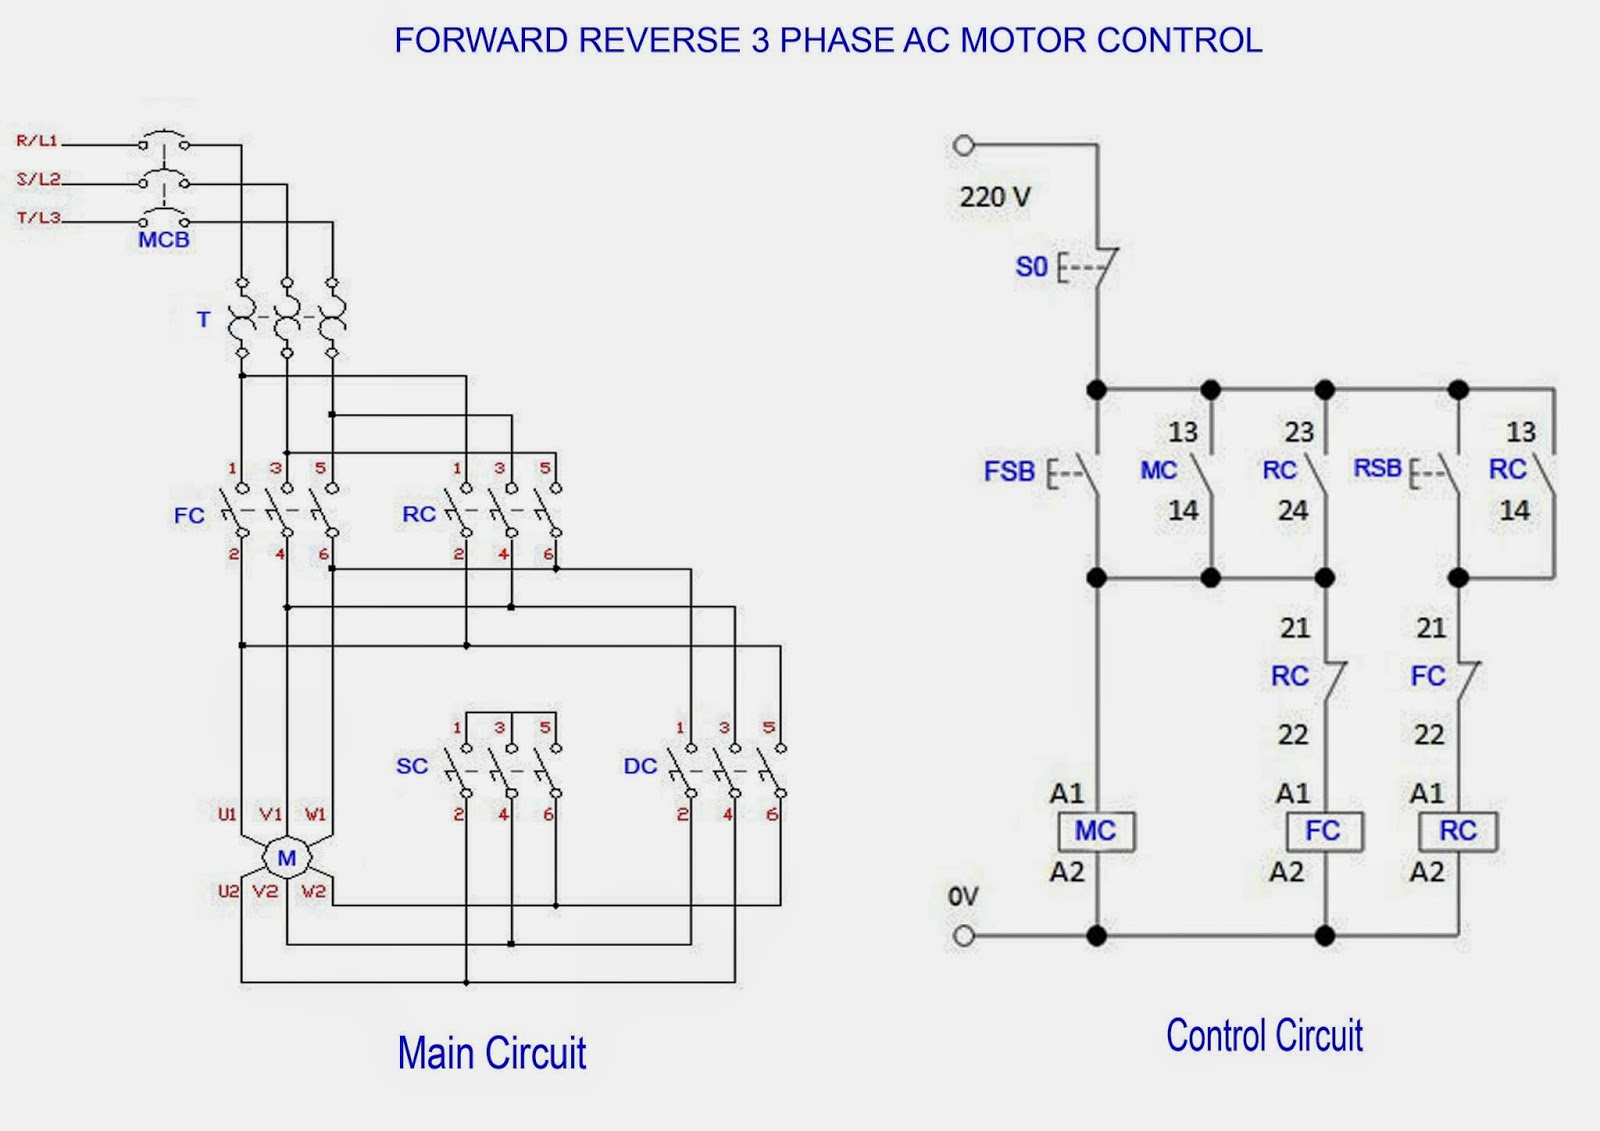 Forward Reverse 3 Phase Ac Motor Control Wiring Diagram